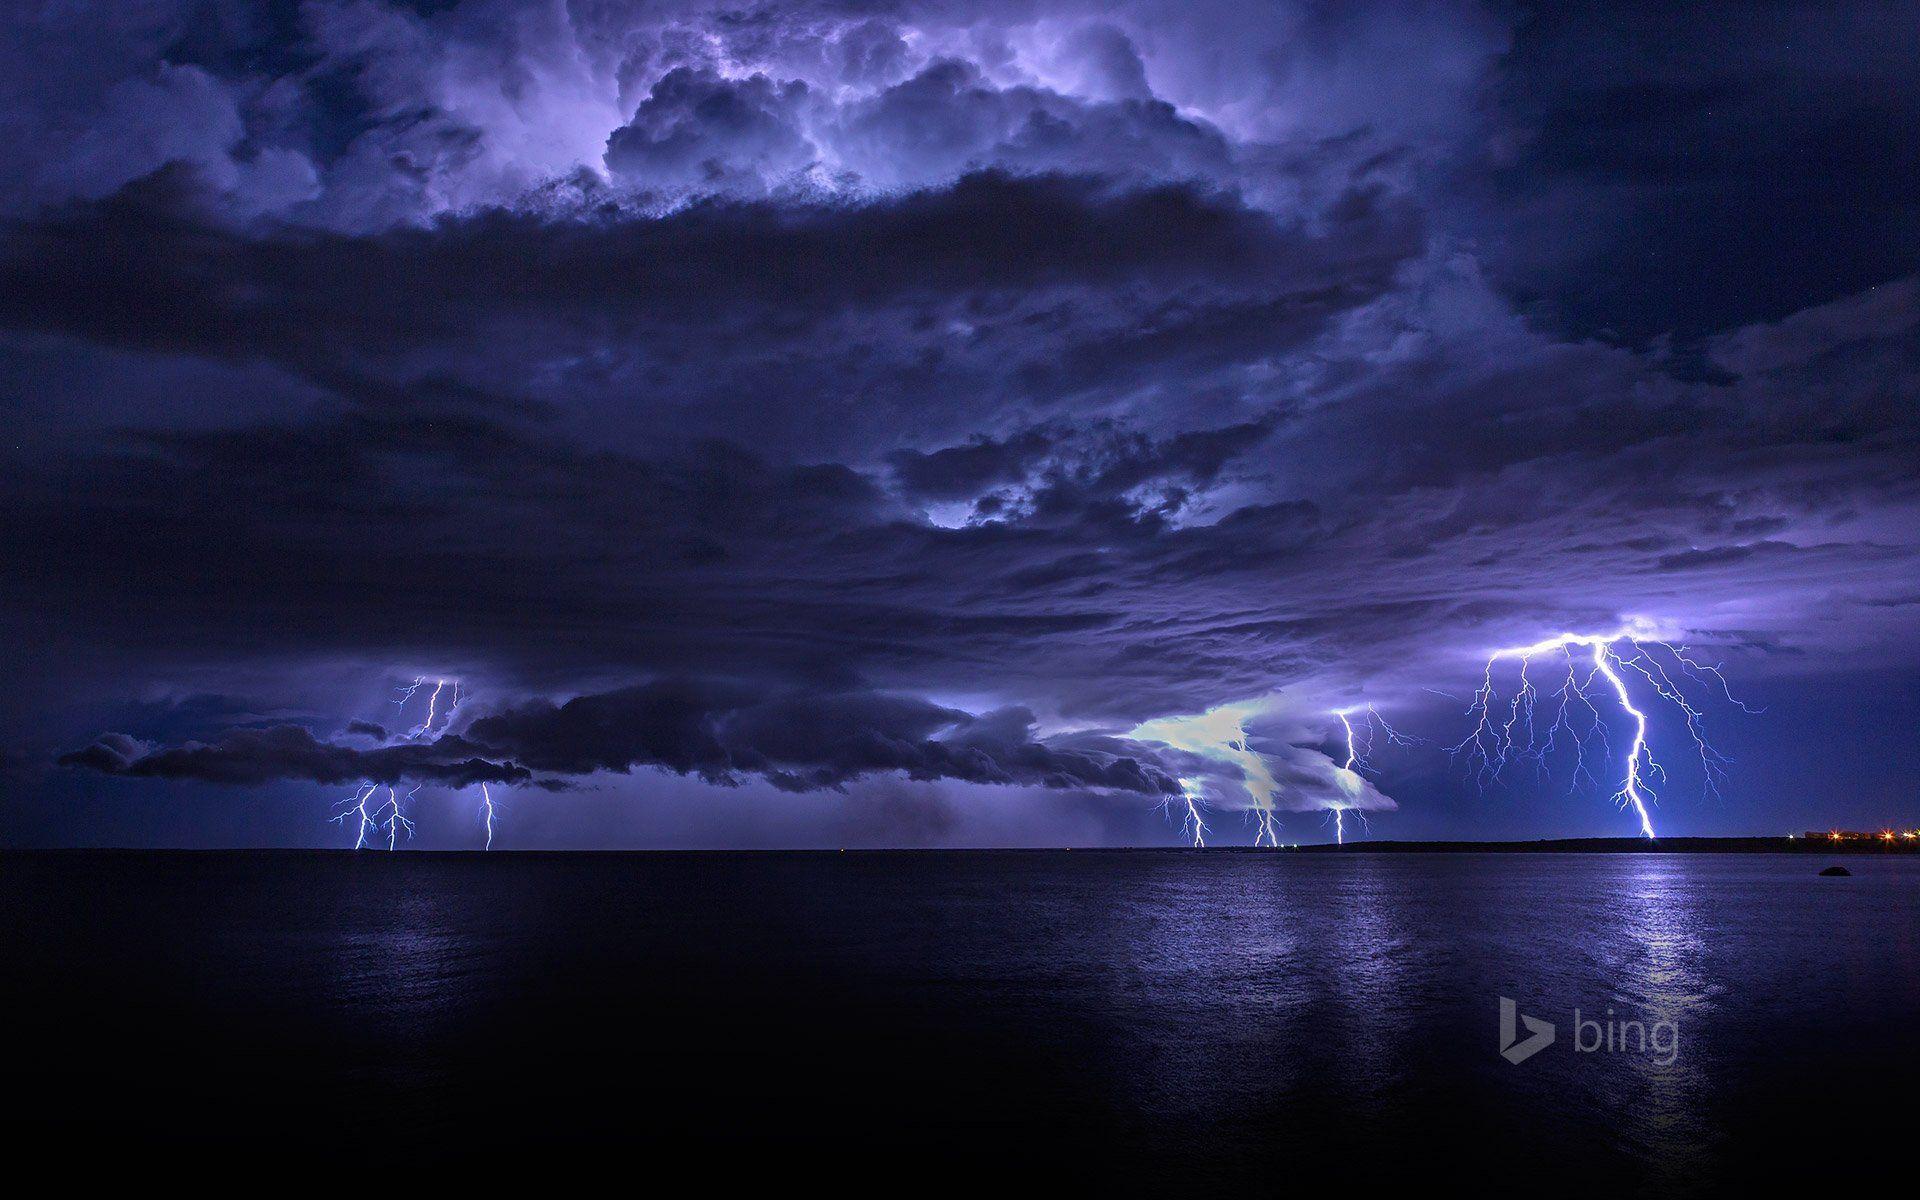 sky clouds the storm lightning sea night lights HD